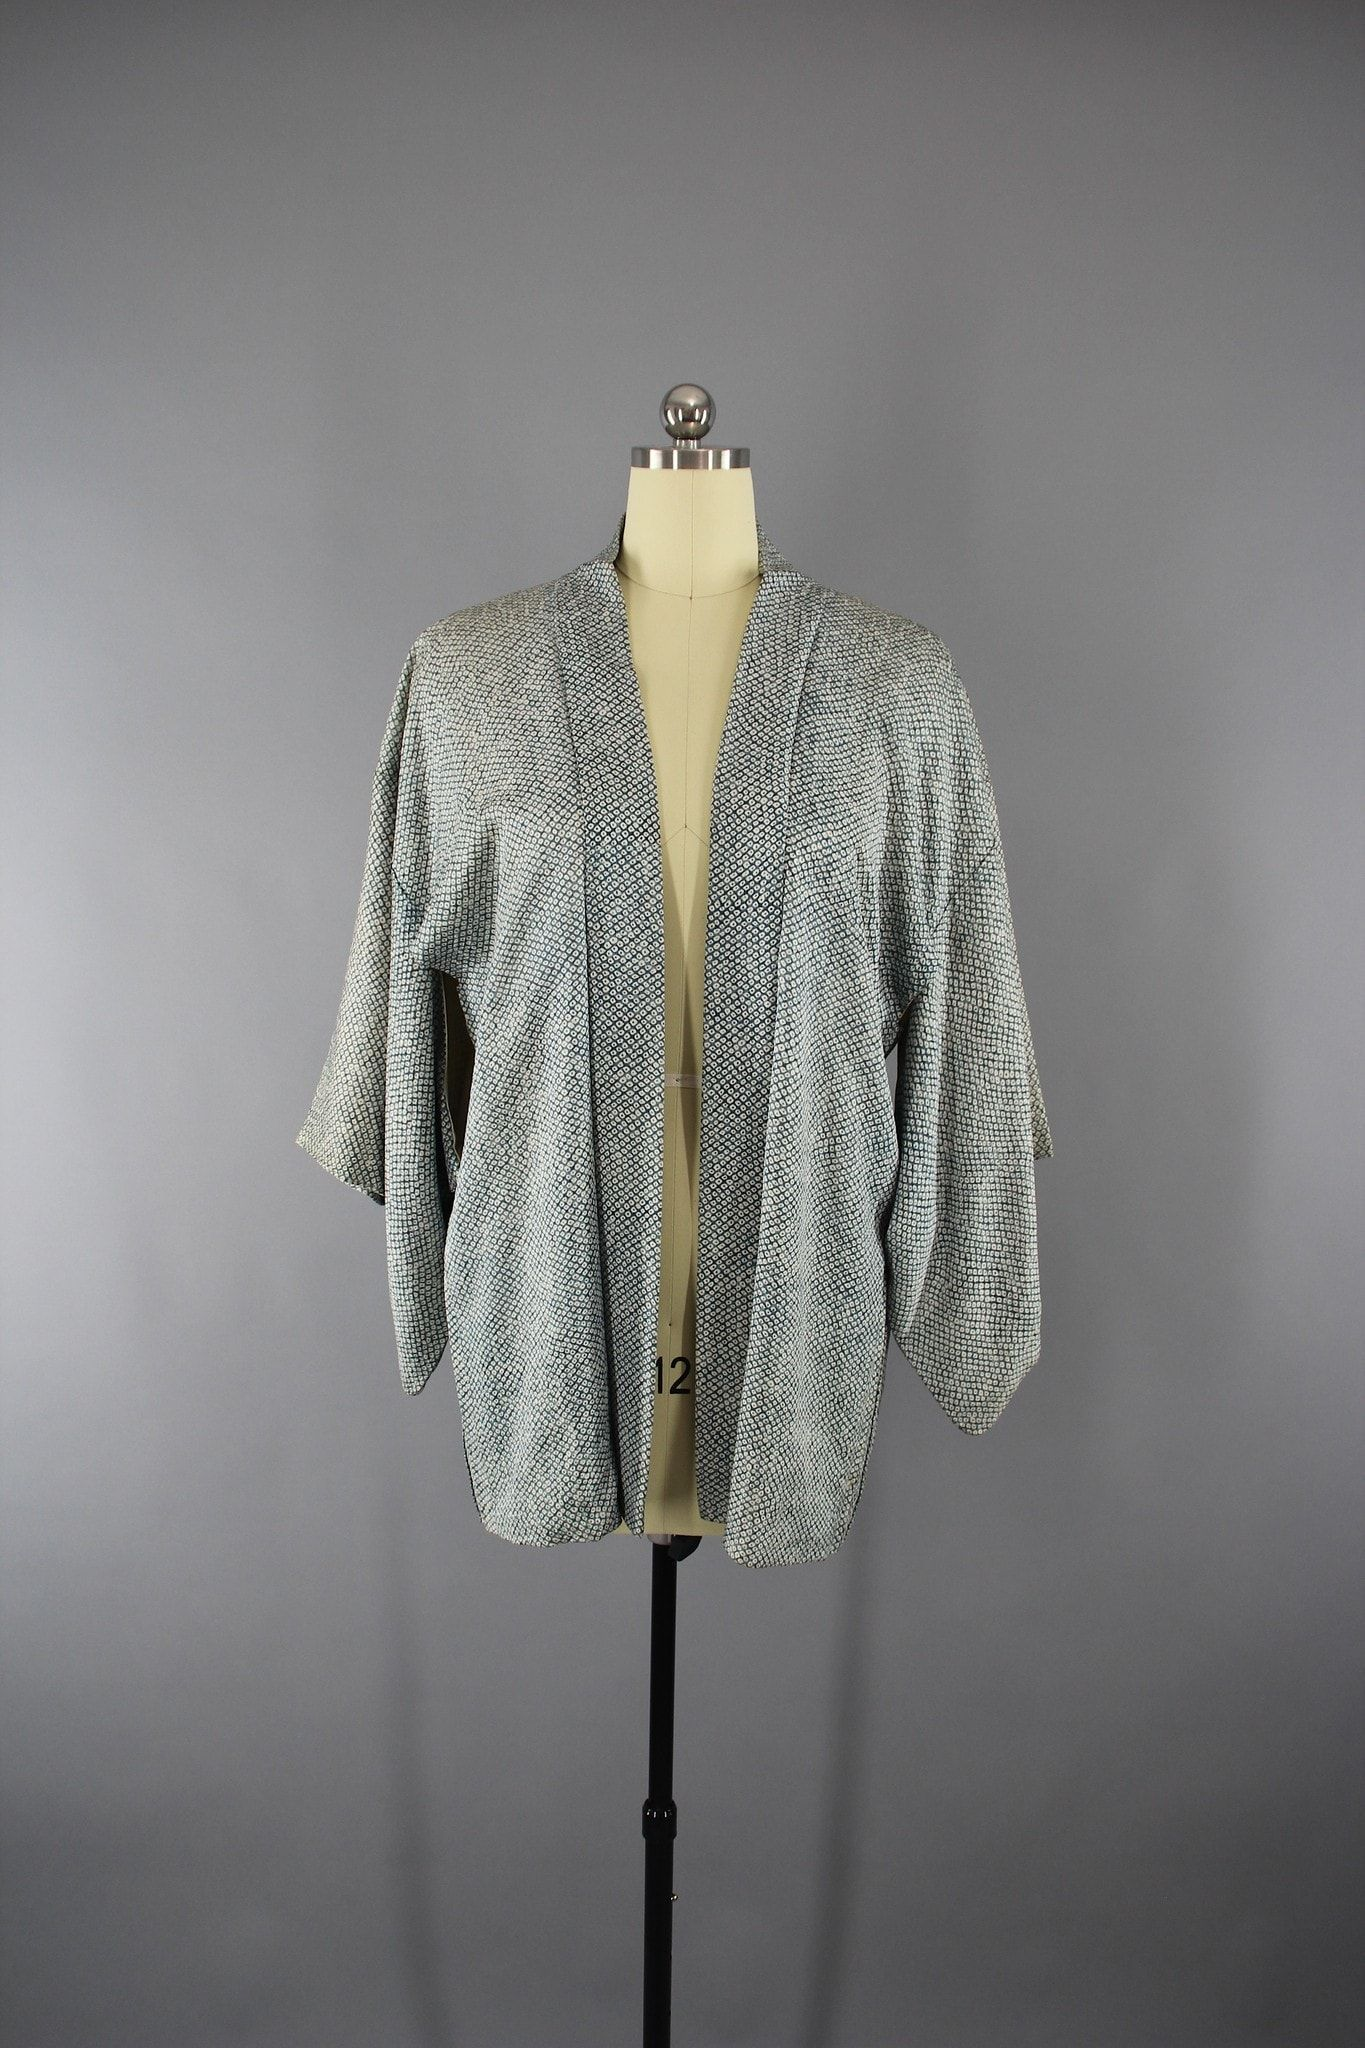 1950s Vintage Silk Haori Kimono Jacket in Blue Green Shibori